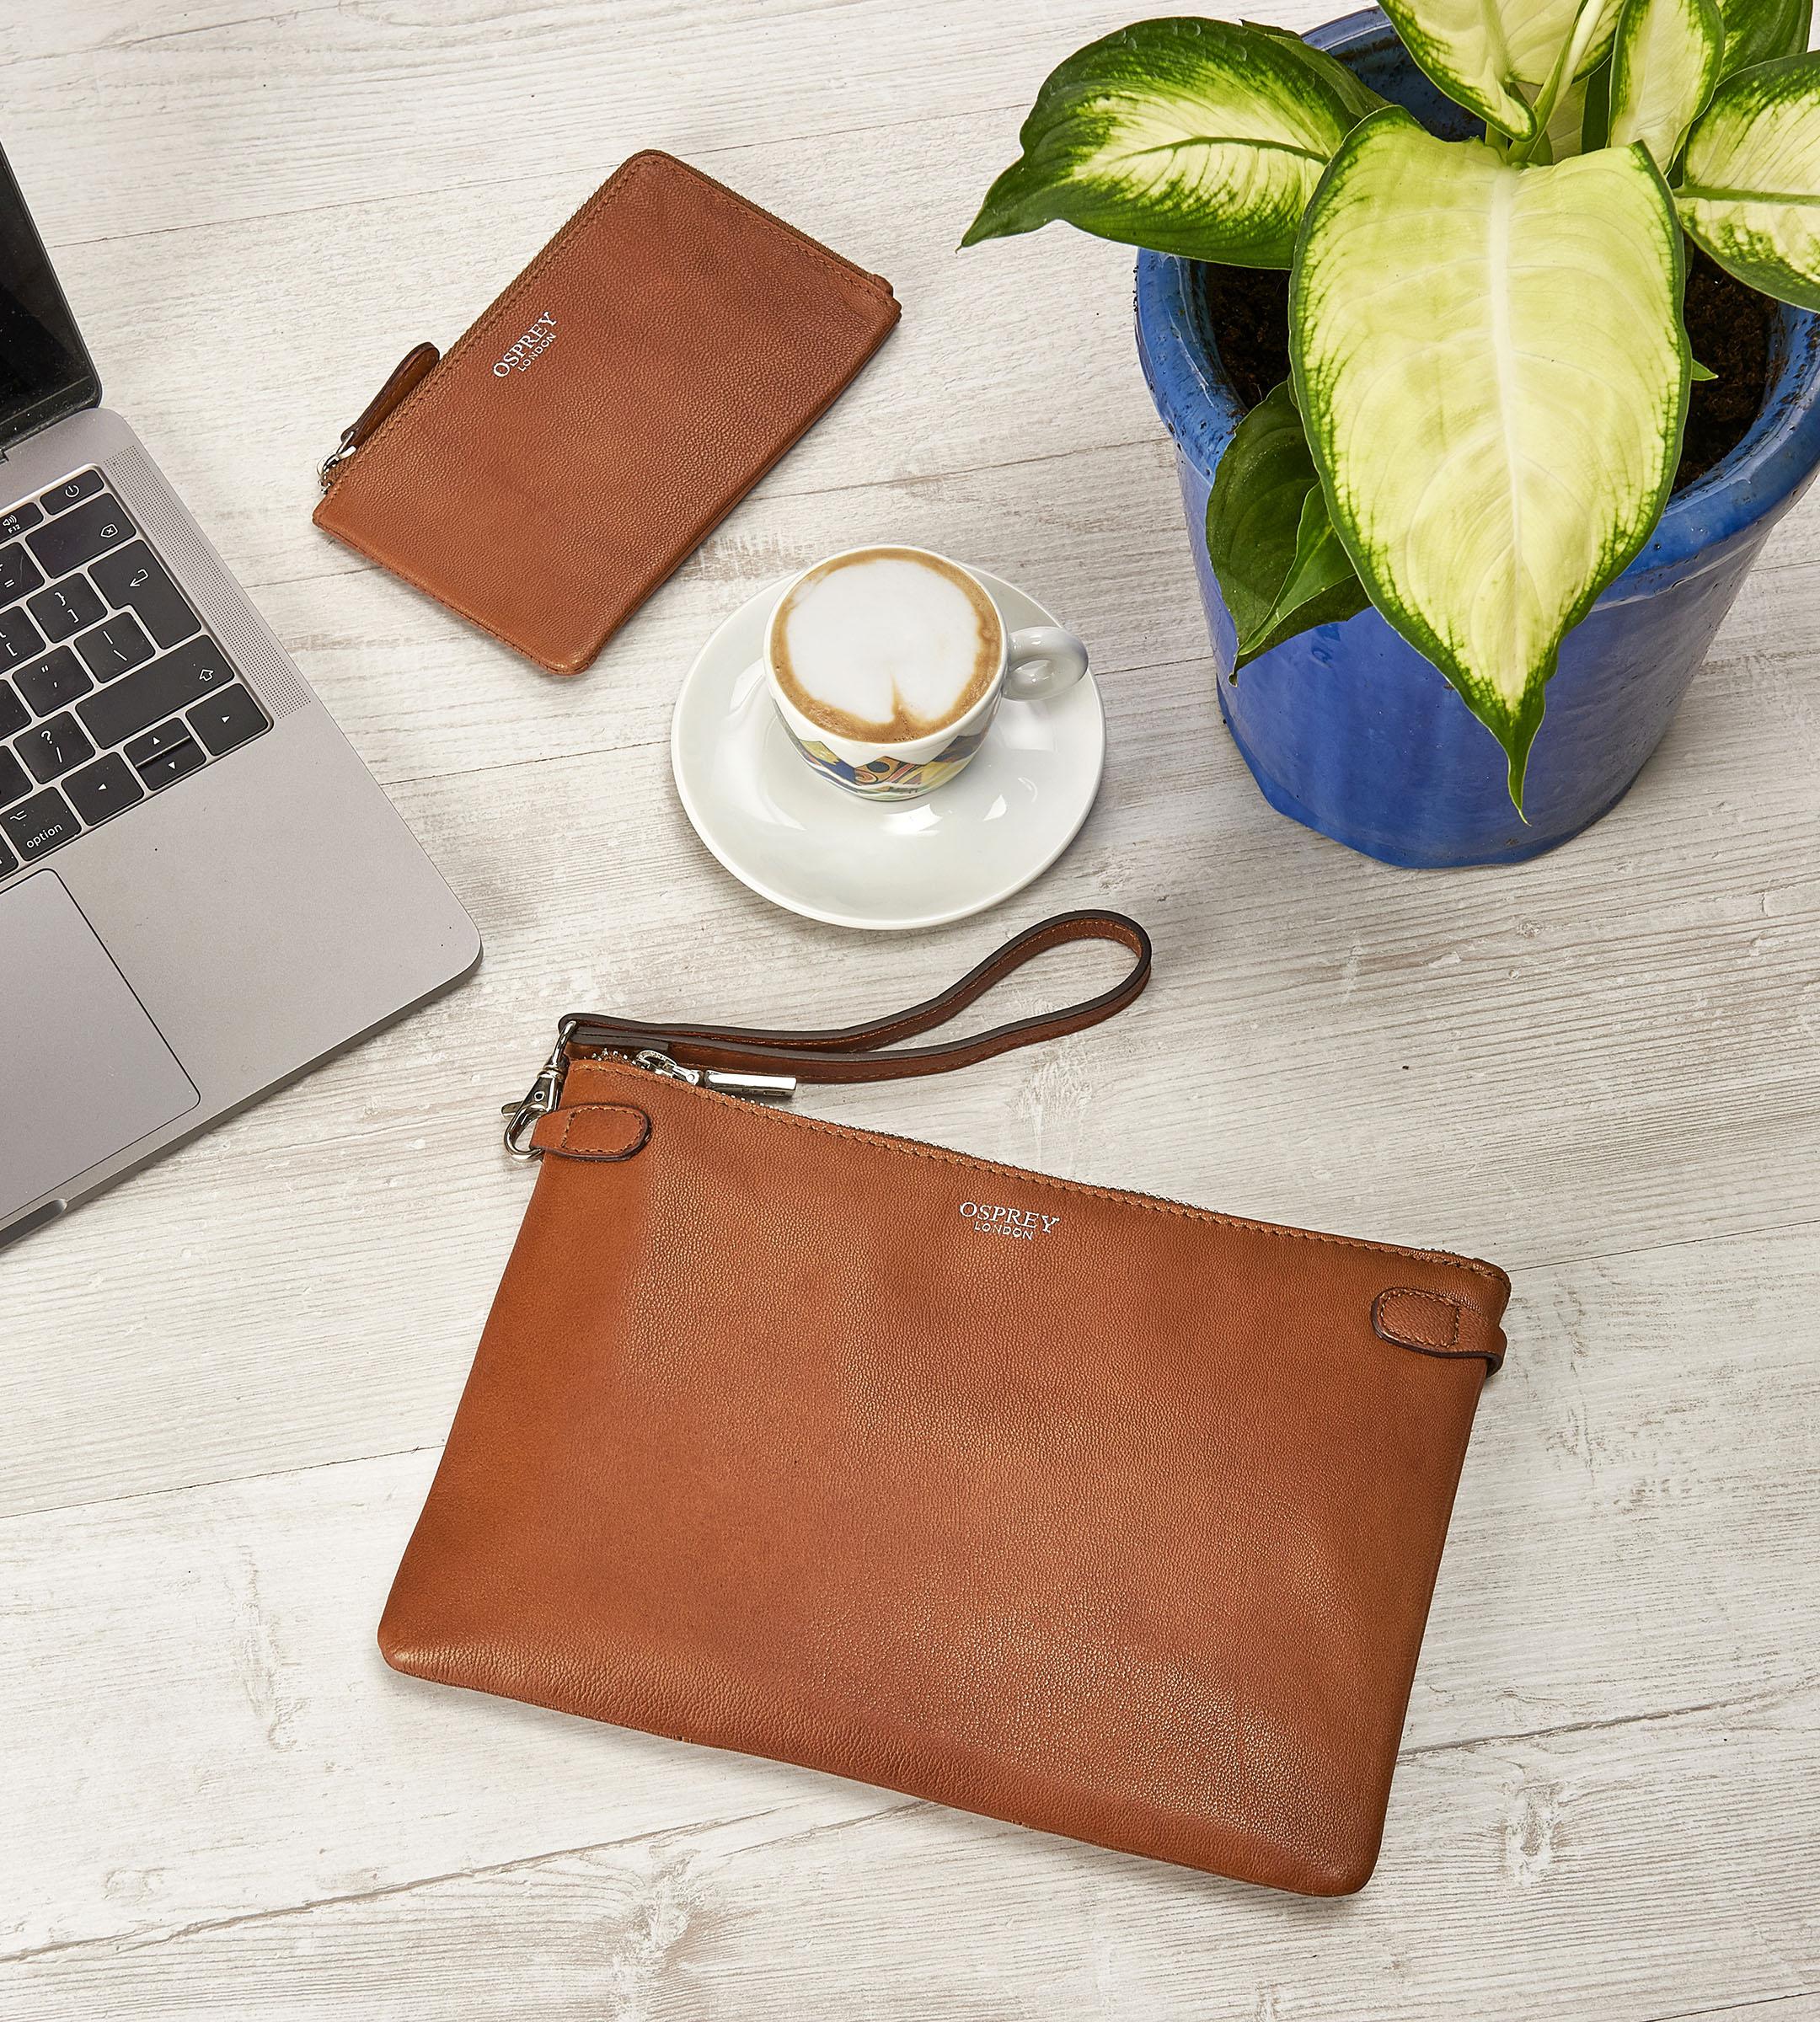 Bag & Purse Flat Lay